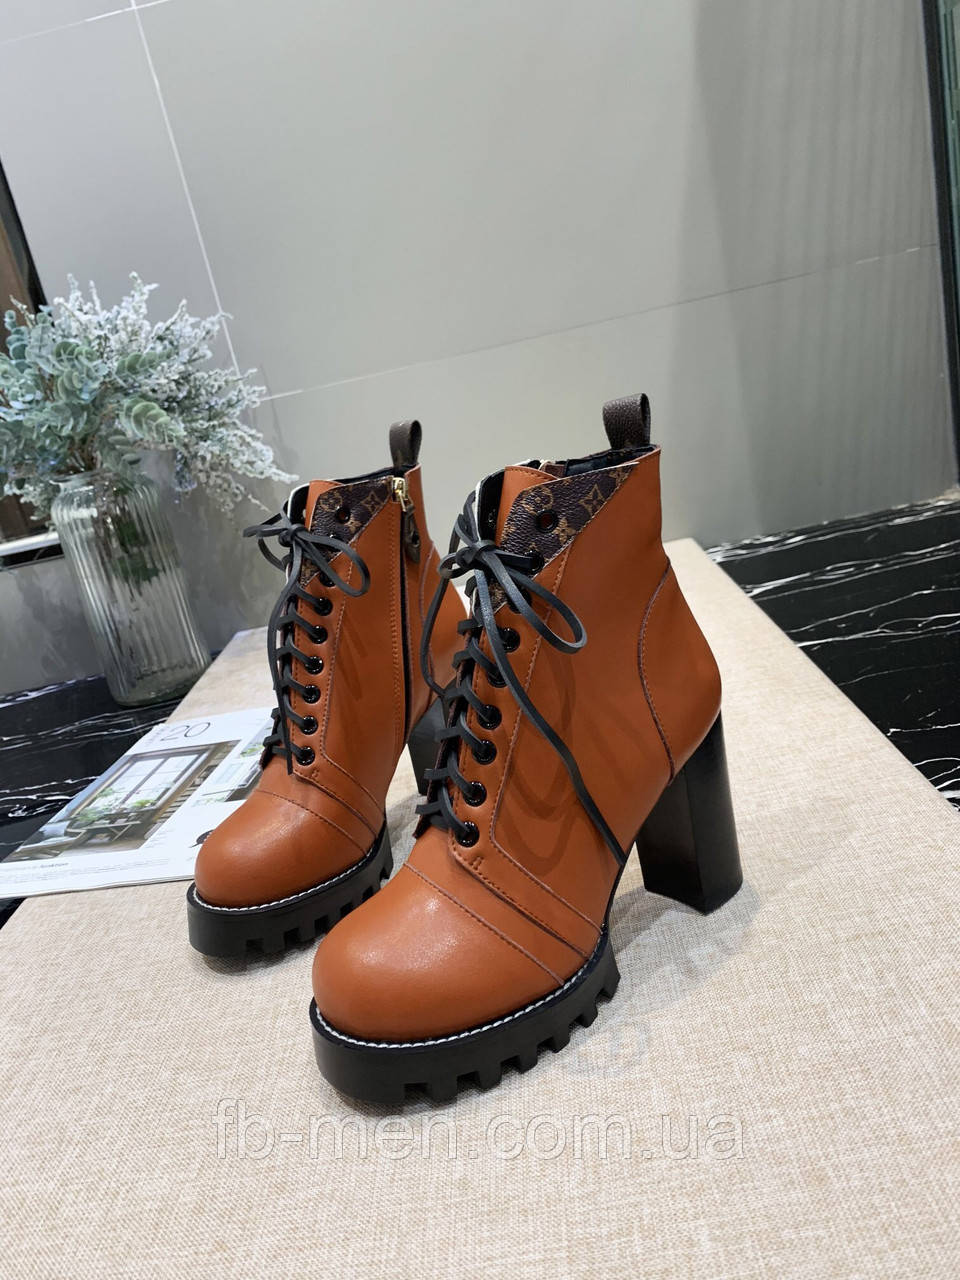 Ботинки Louis Vuitton|Женские кожаные ботинки Луи Виттон коричневого цвета со шнурками на каблуках